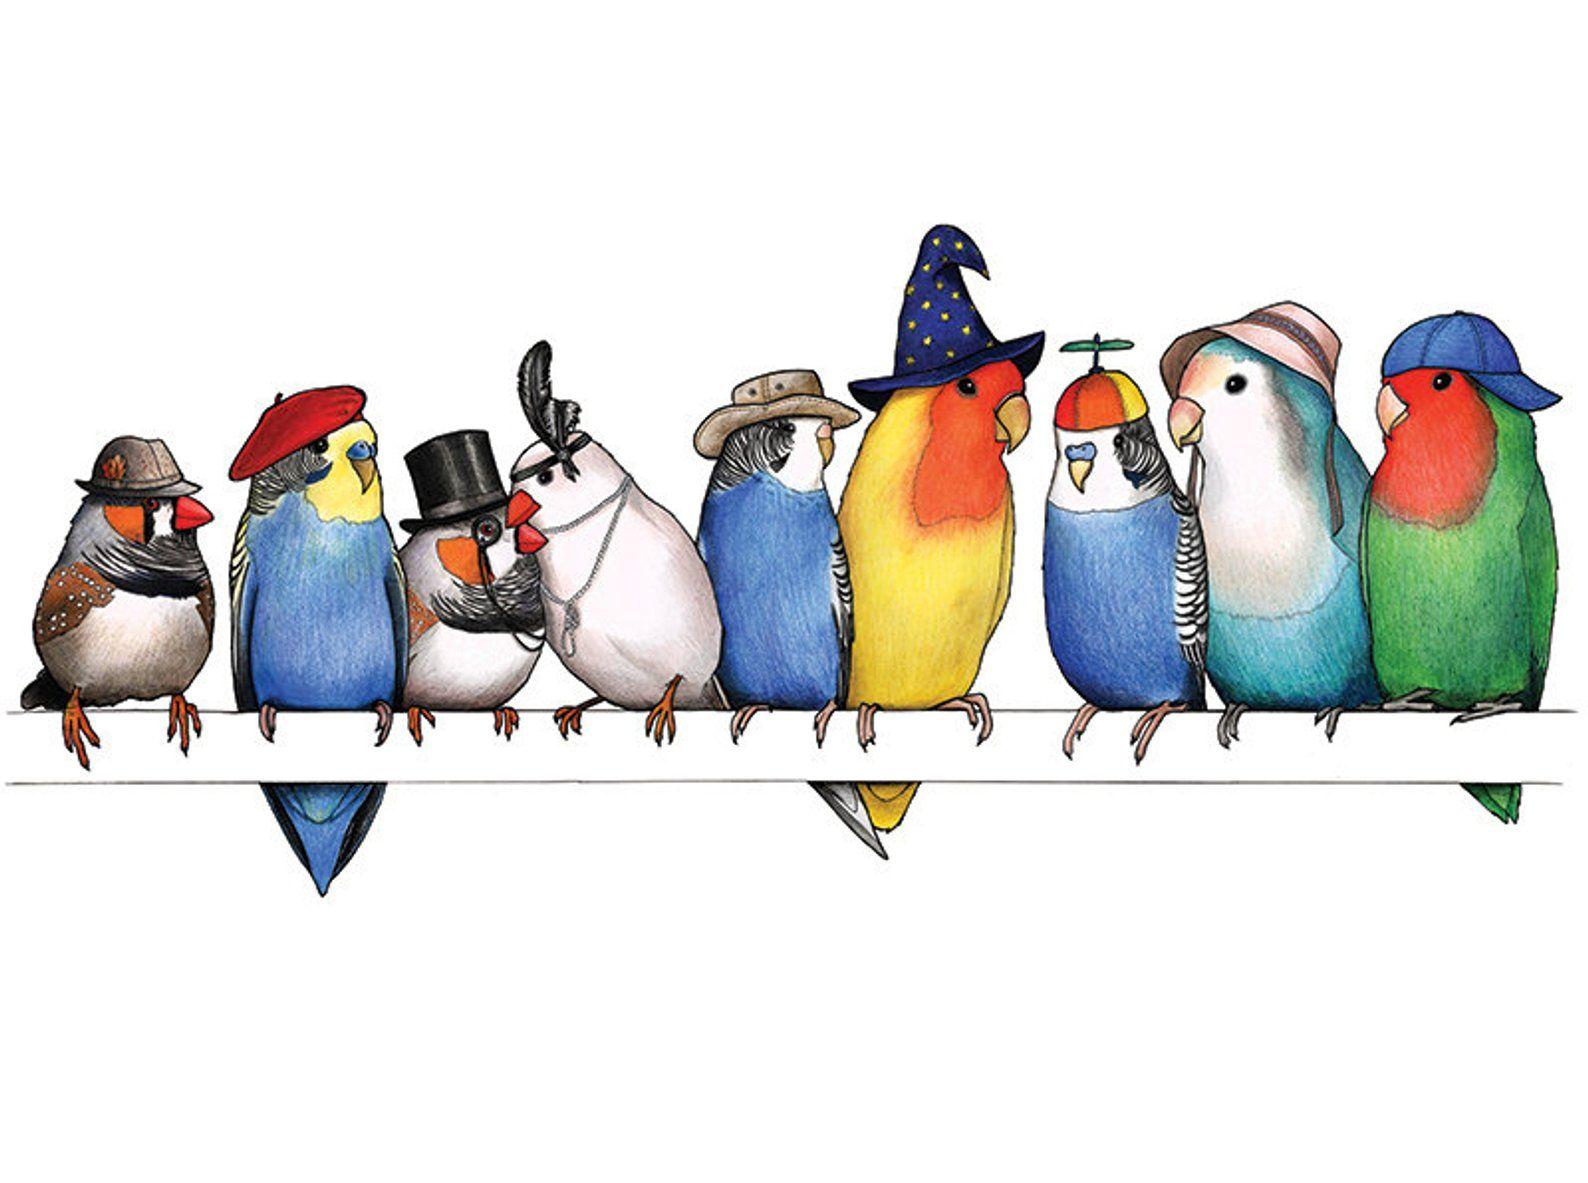 A Row Of Little Birds In Hats A3 Art Print Etsy Bird Art Print Bird Art Bird Drawings